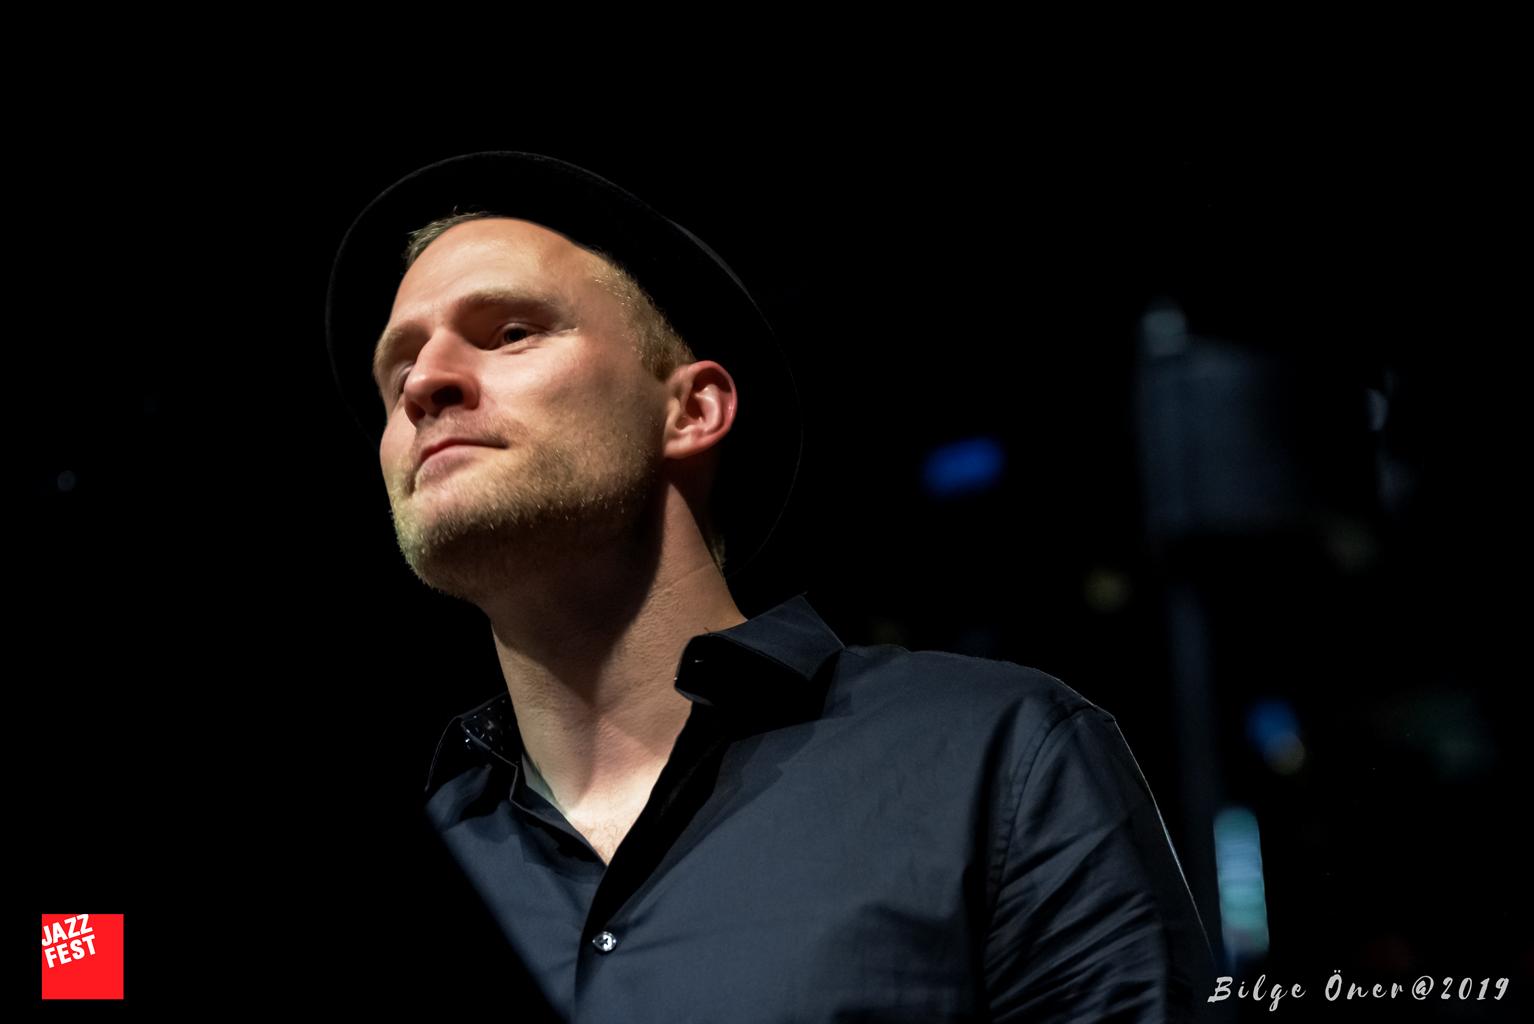 110519-S.-Møller-Beats-&-Big-Band-@-Studentsammfunnet-foto-Bilge-Öner-10.jpg